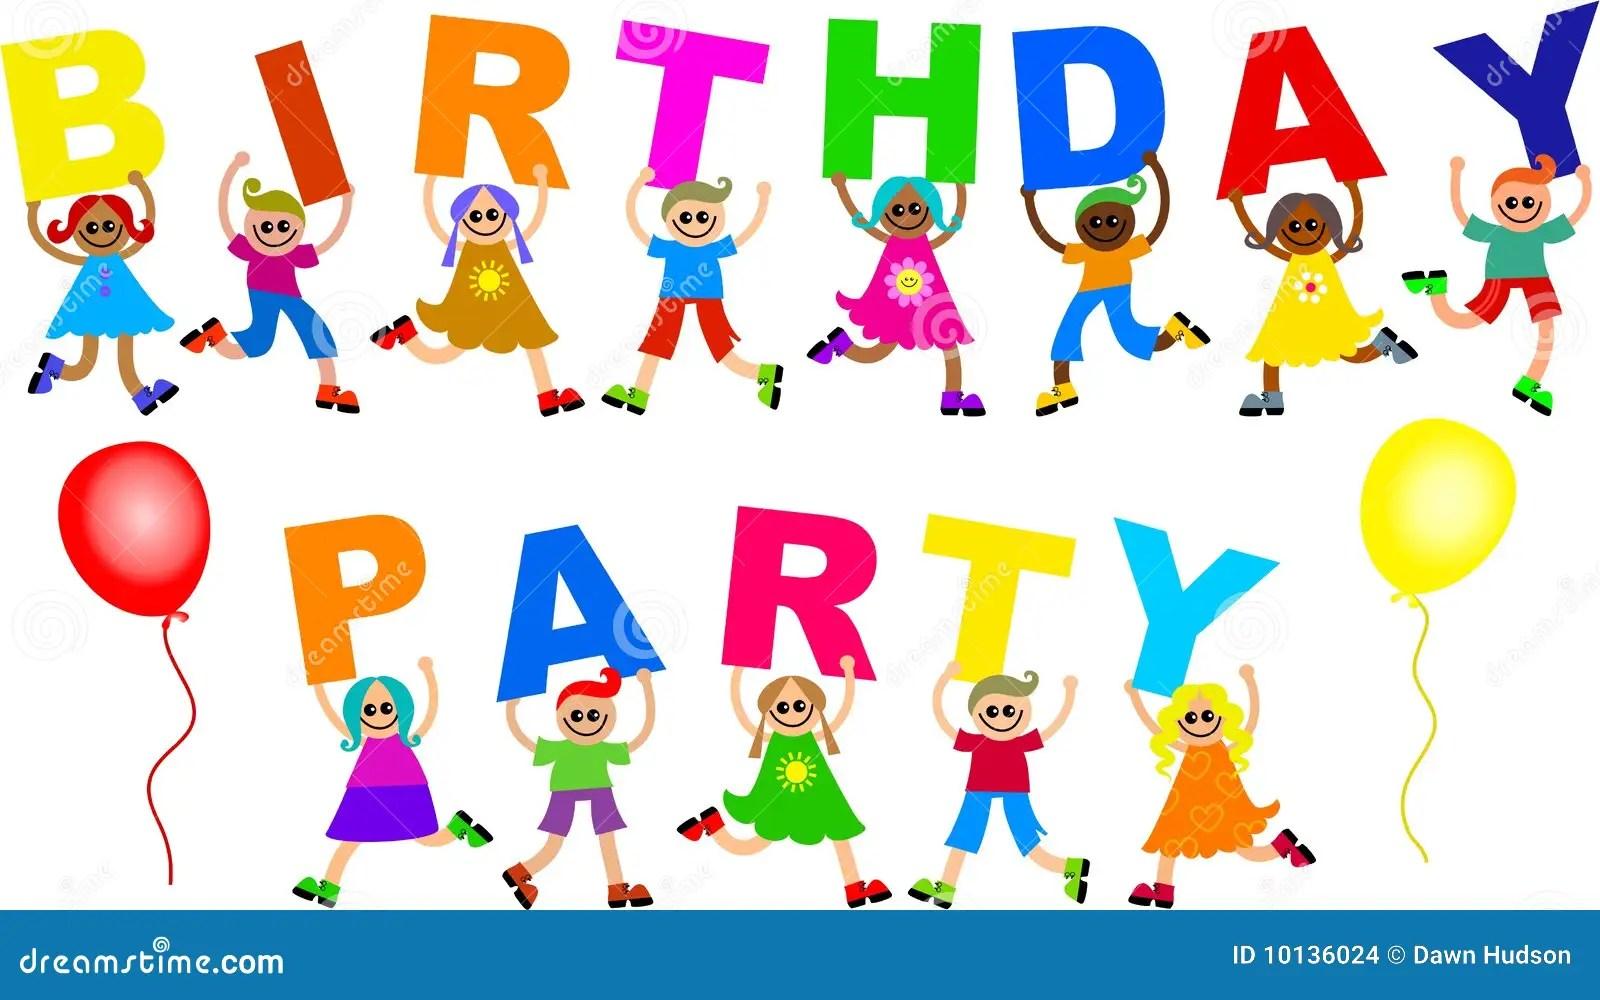 Birthday Party Stock Illustration Illustration Of Diverse 10136024